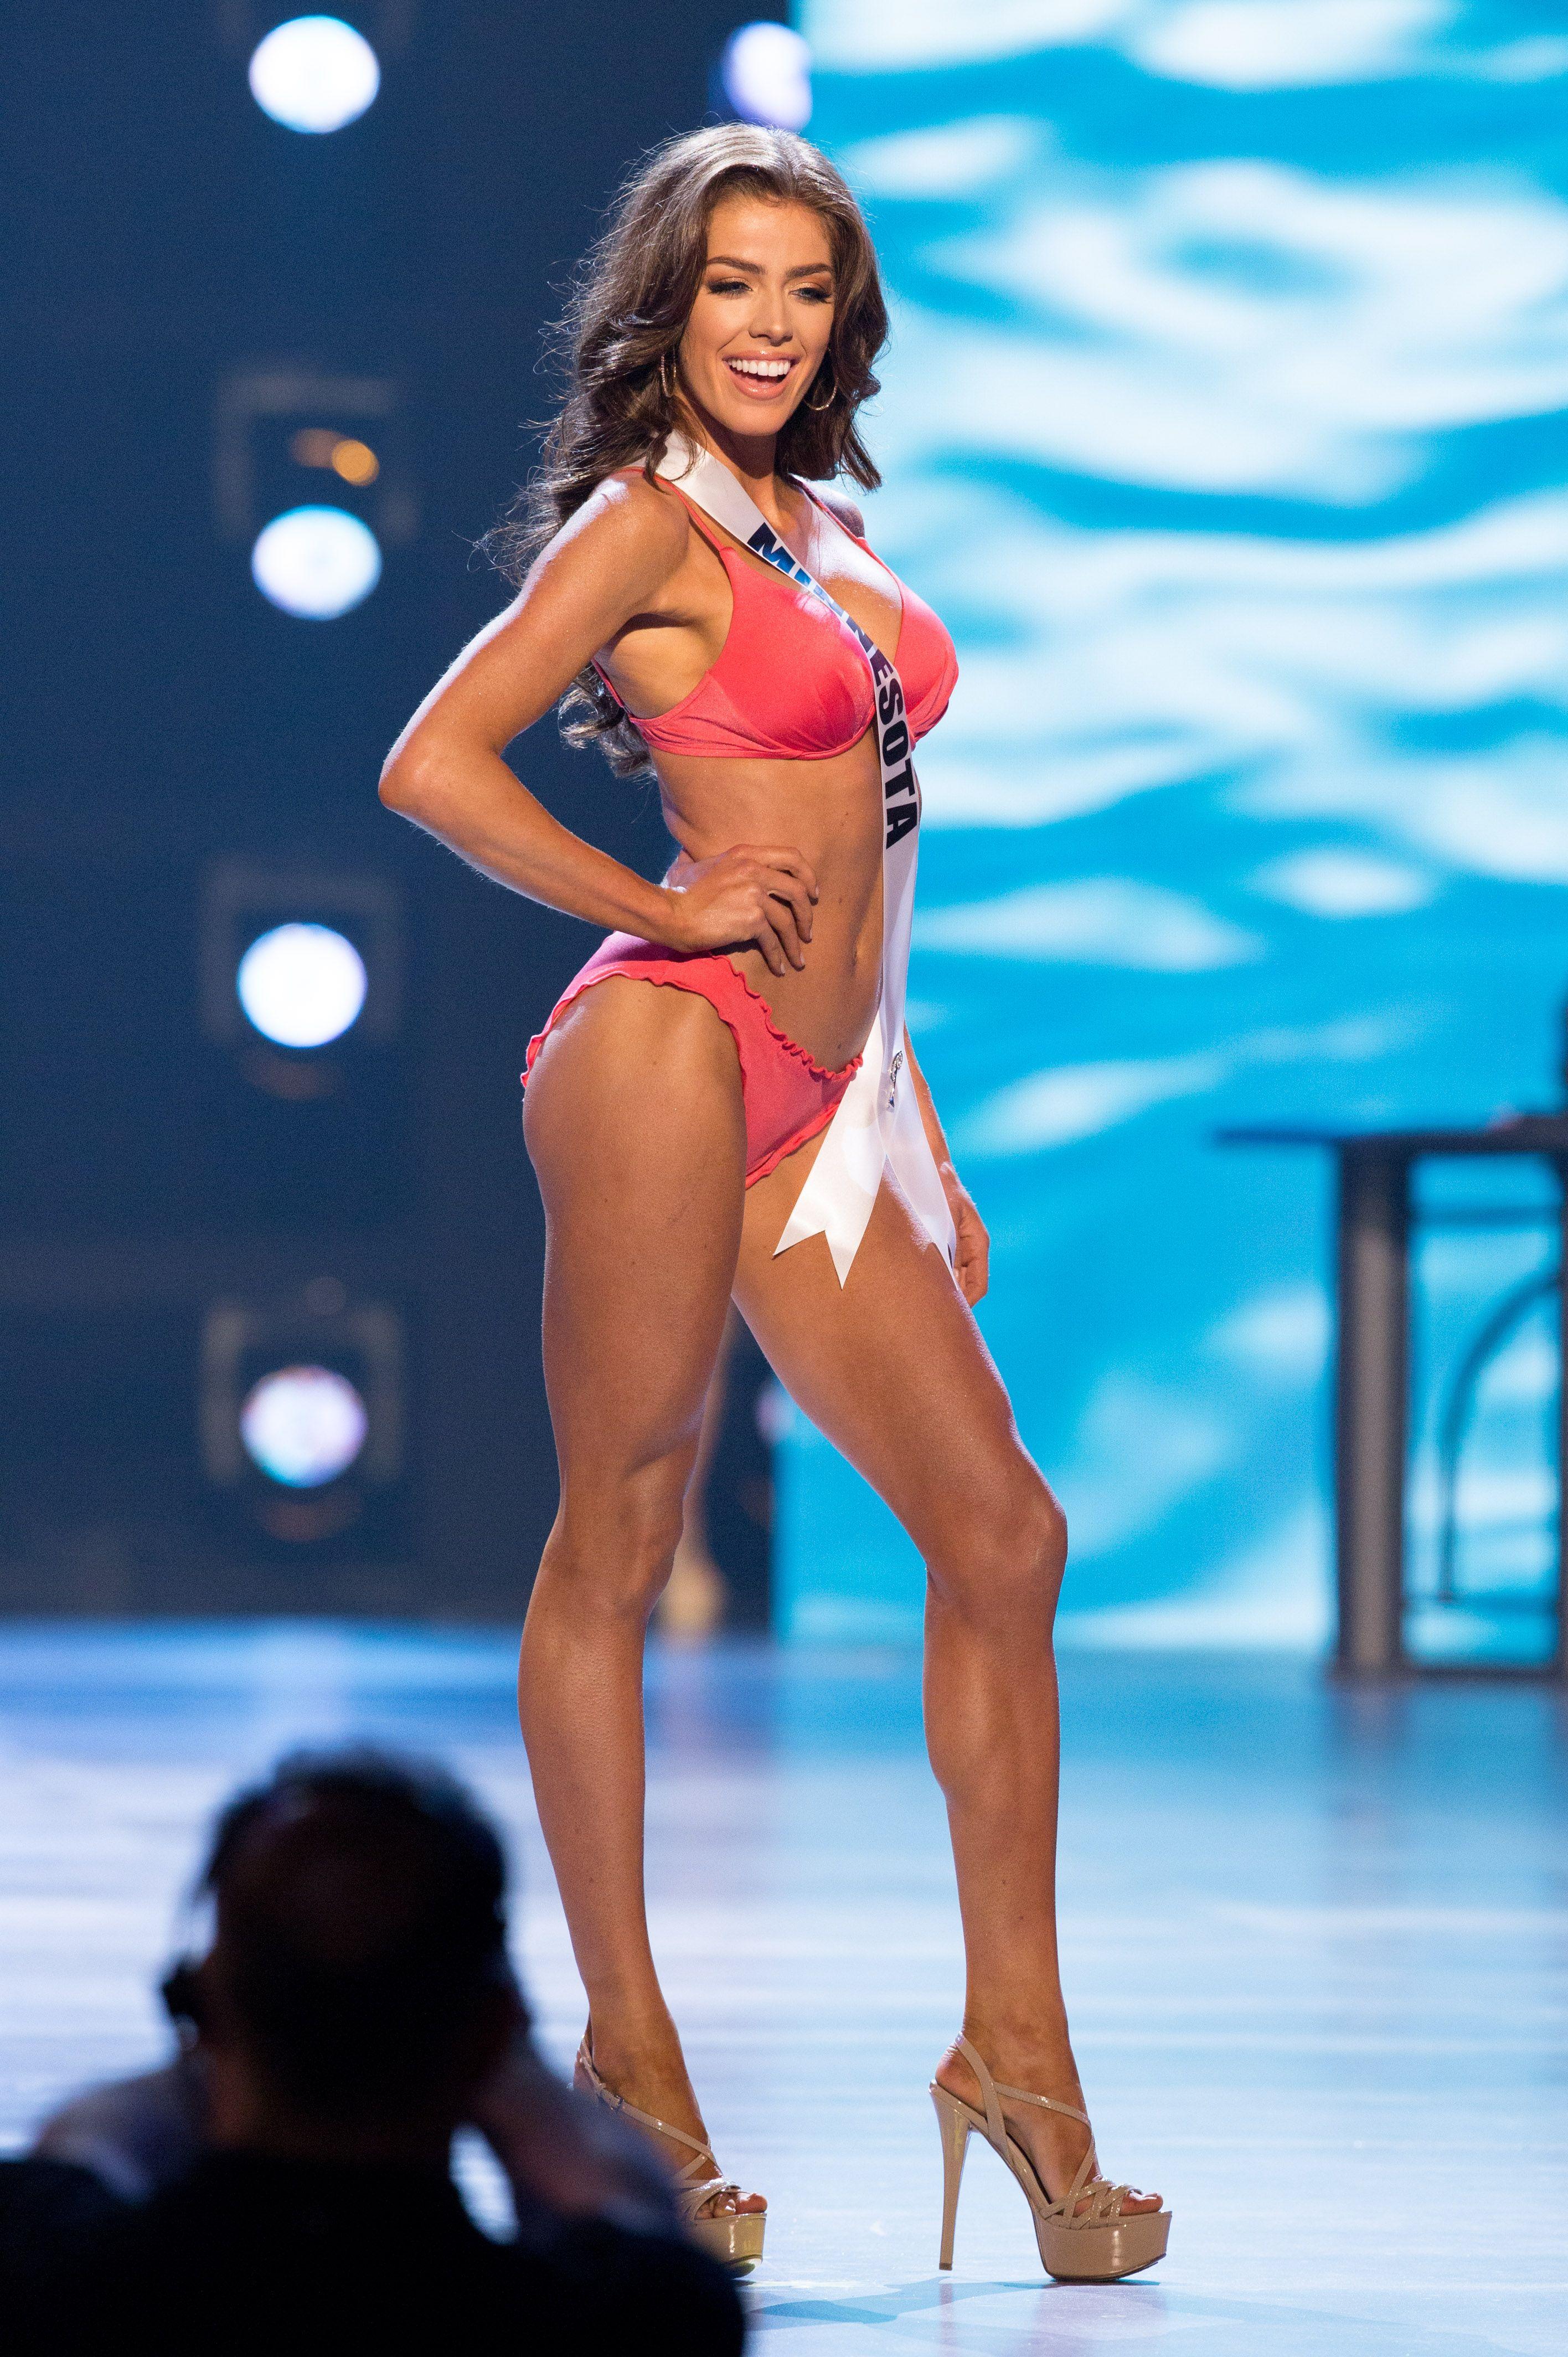 Tube videos search results for over bikini contest part